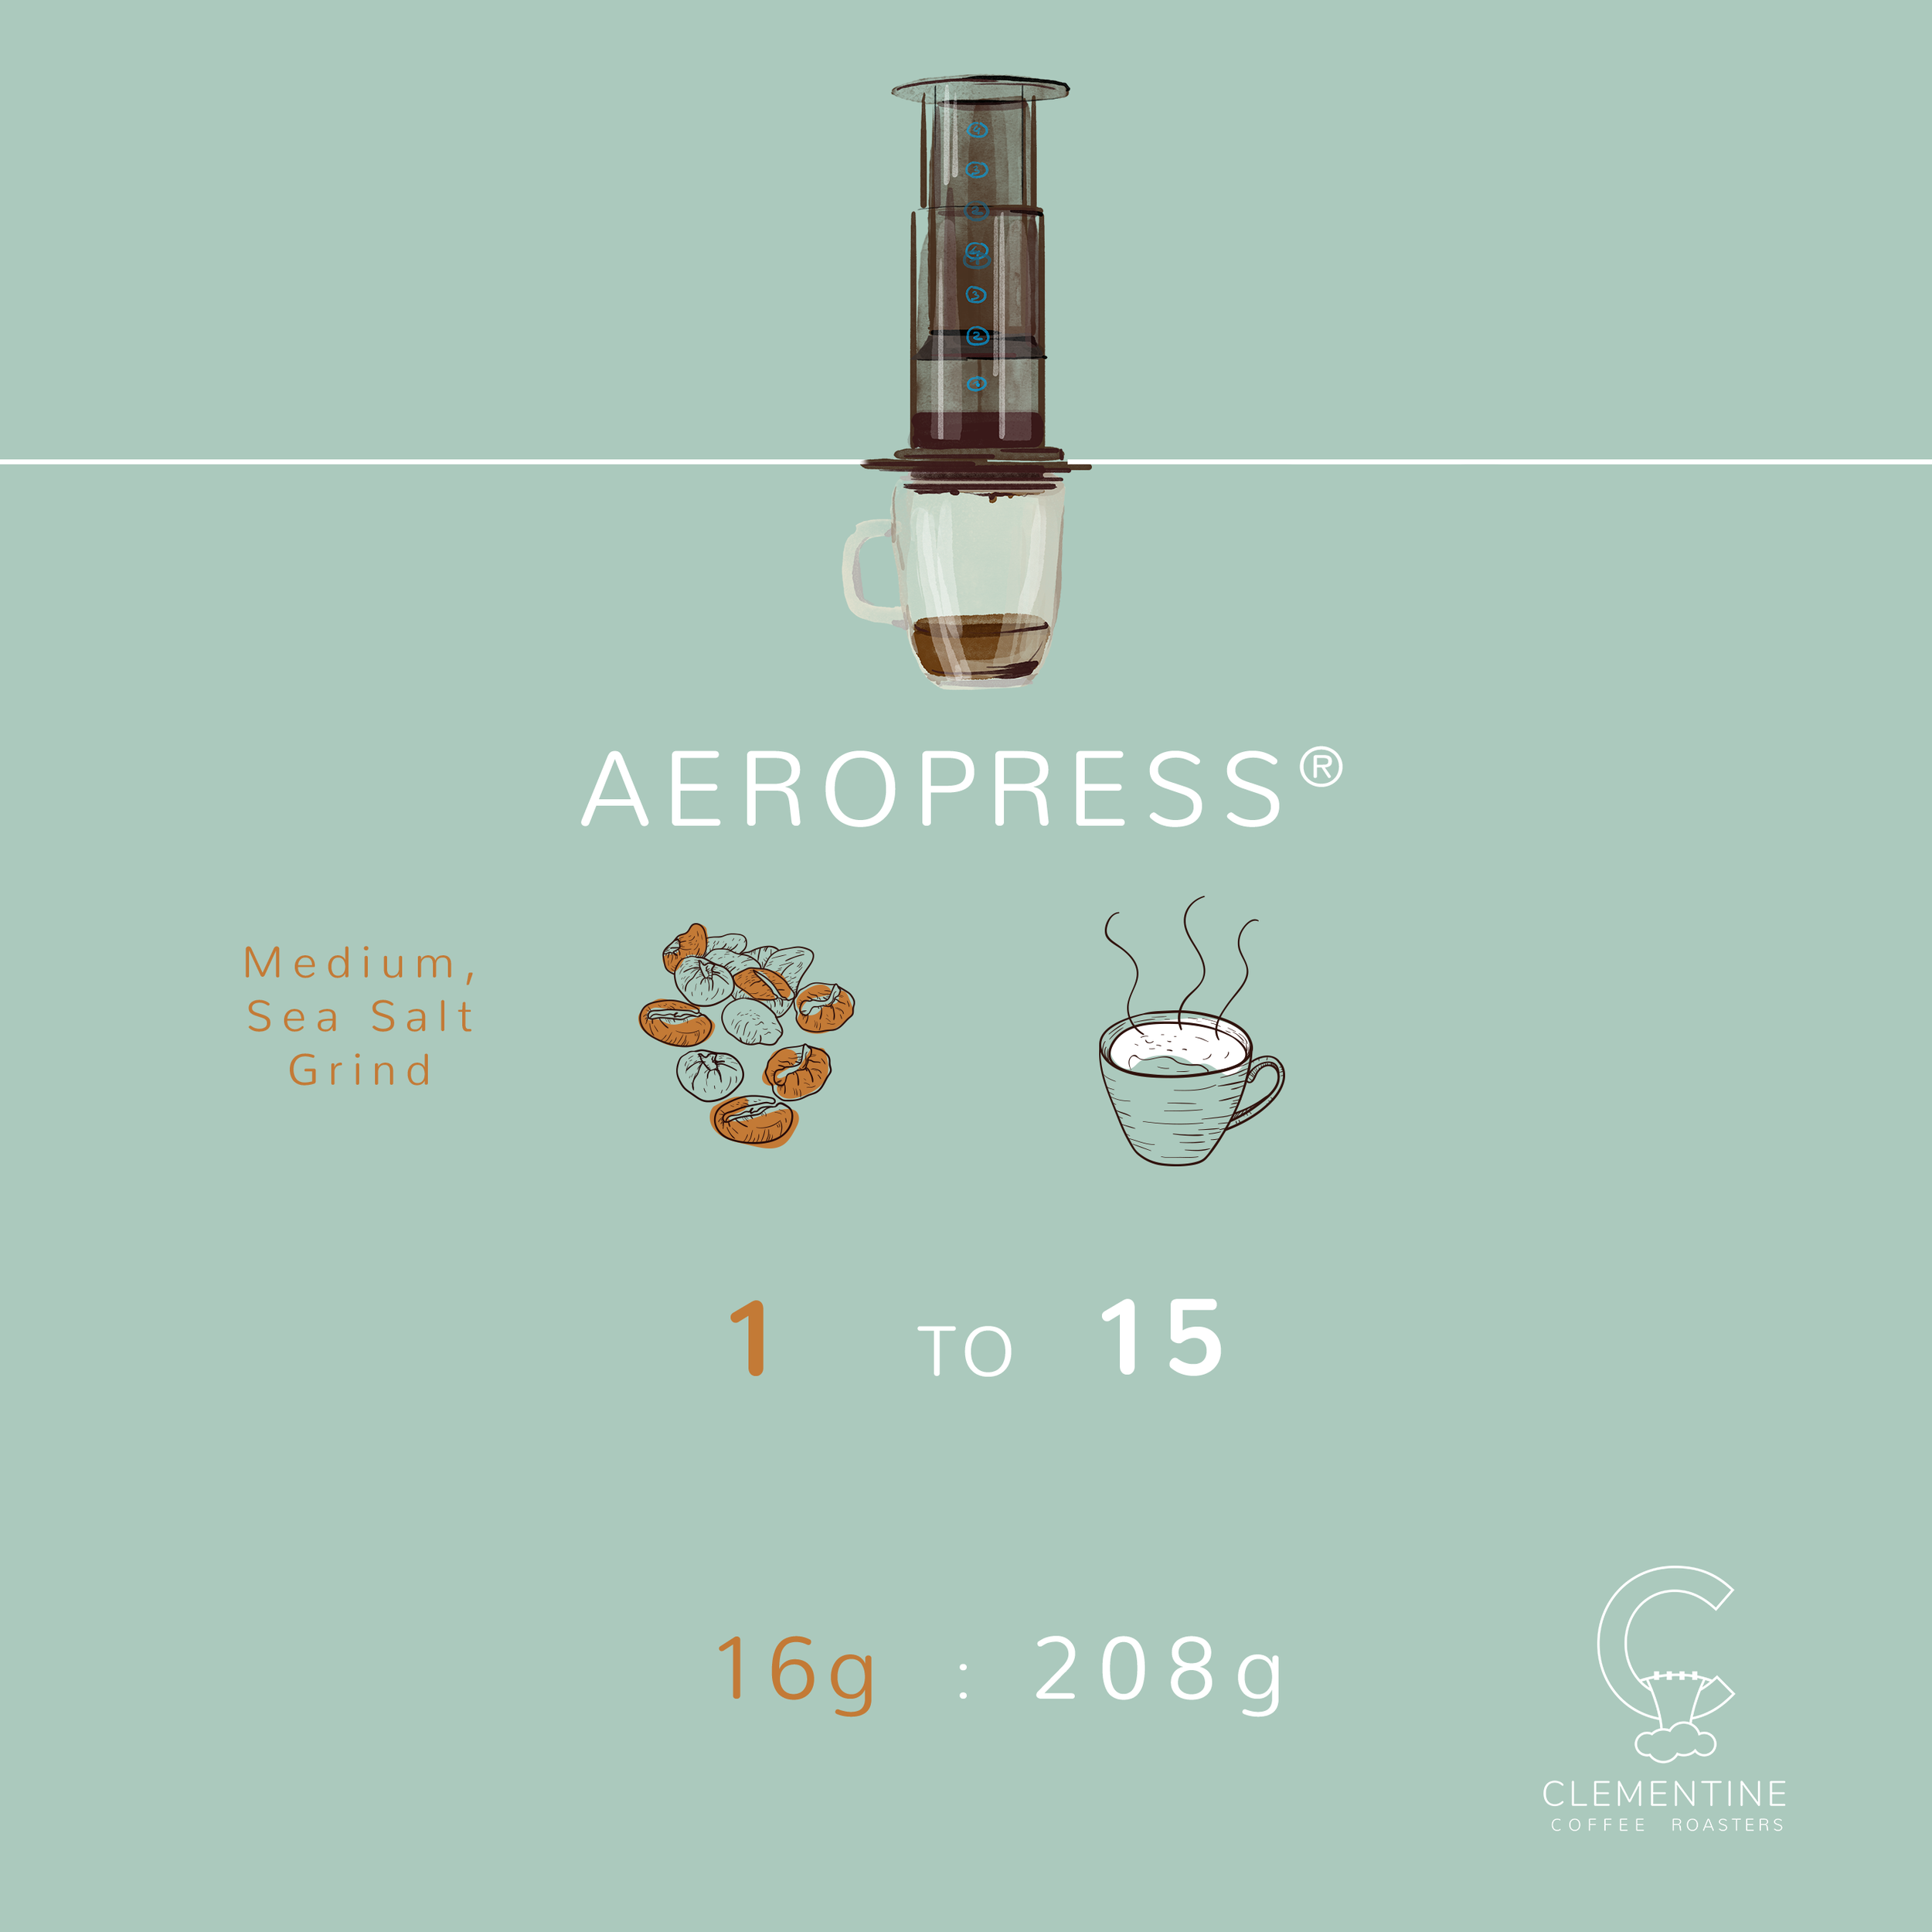 Aeropress_BrewMethod_Graphic.png